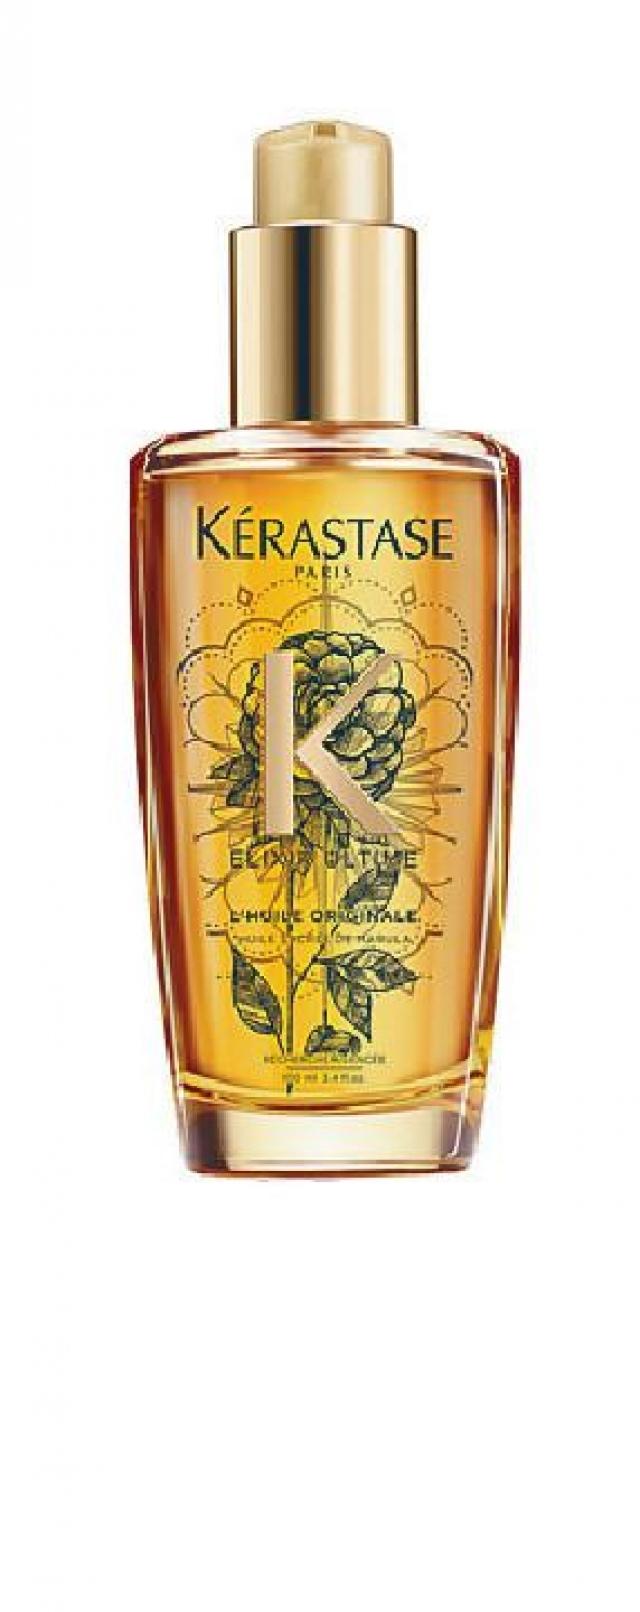 Kerastase 極緻全效修護精華 $400 以珍貴的山茶花籽油製成,山茶花帶有含蓄芬芳,而當中的油酸和亞麻油酸能滋潤並撫平毛燥髮絲,令秀髮豐盈柔軟,同時綻放璀璨亮澤。